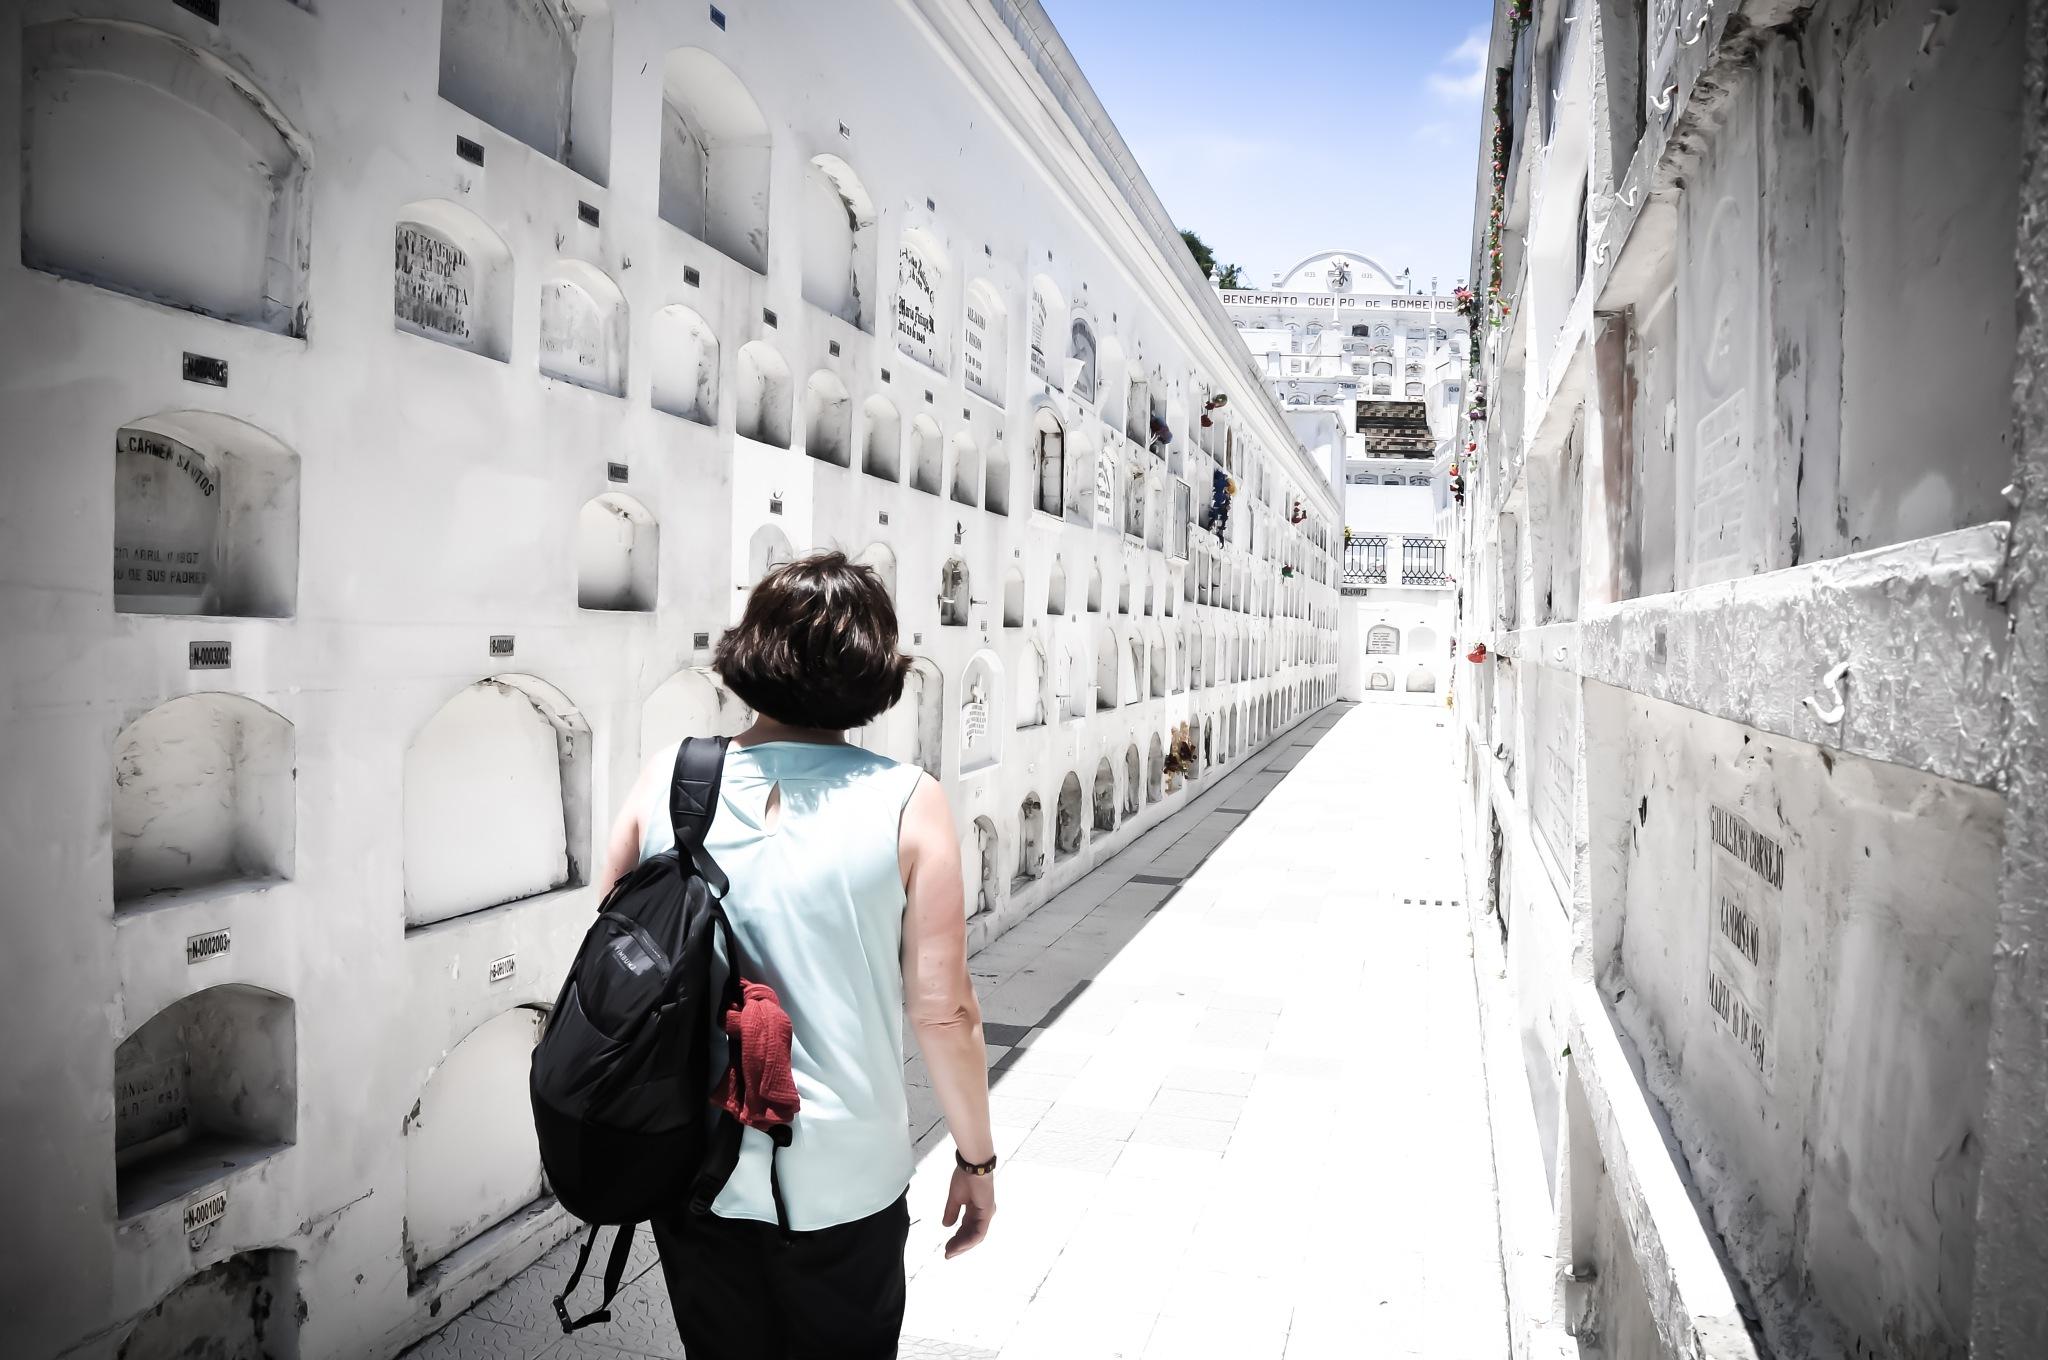 Cementerio Patrimonial, Guayaquil (Ecuador) by Jiri Bielicky